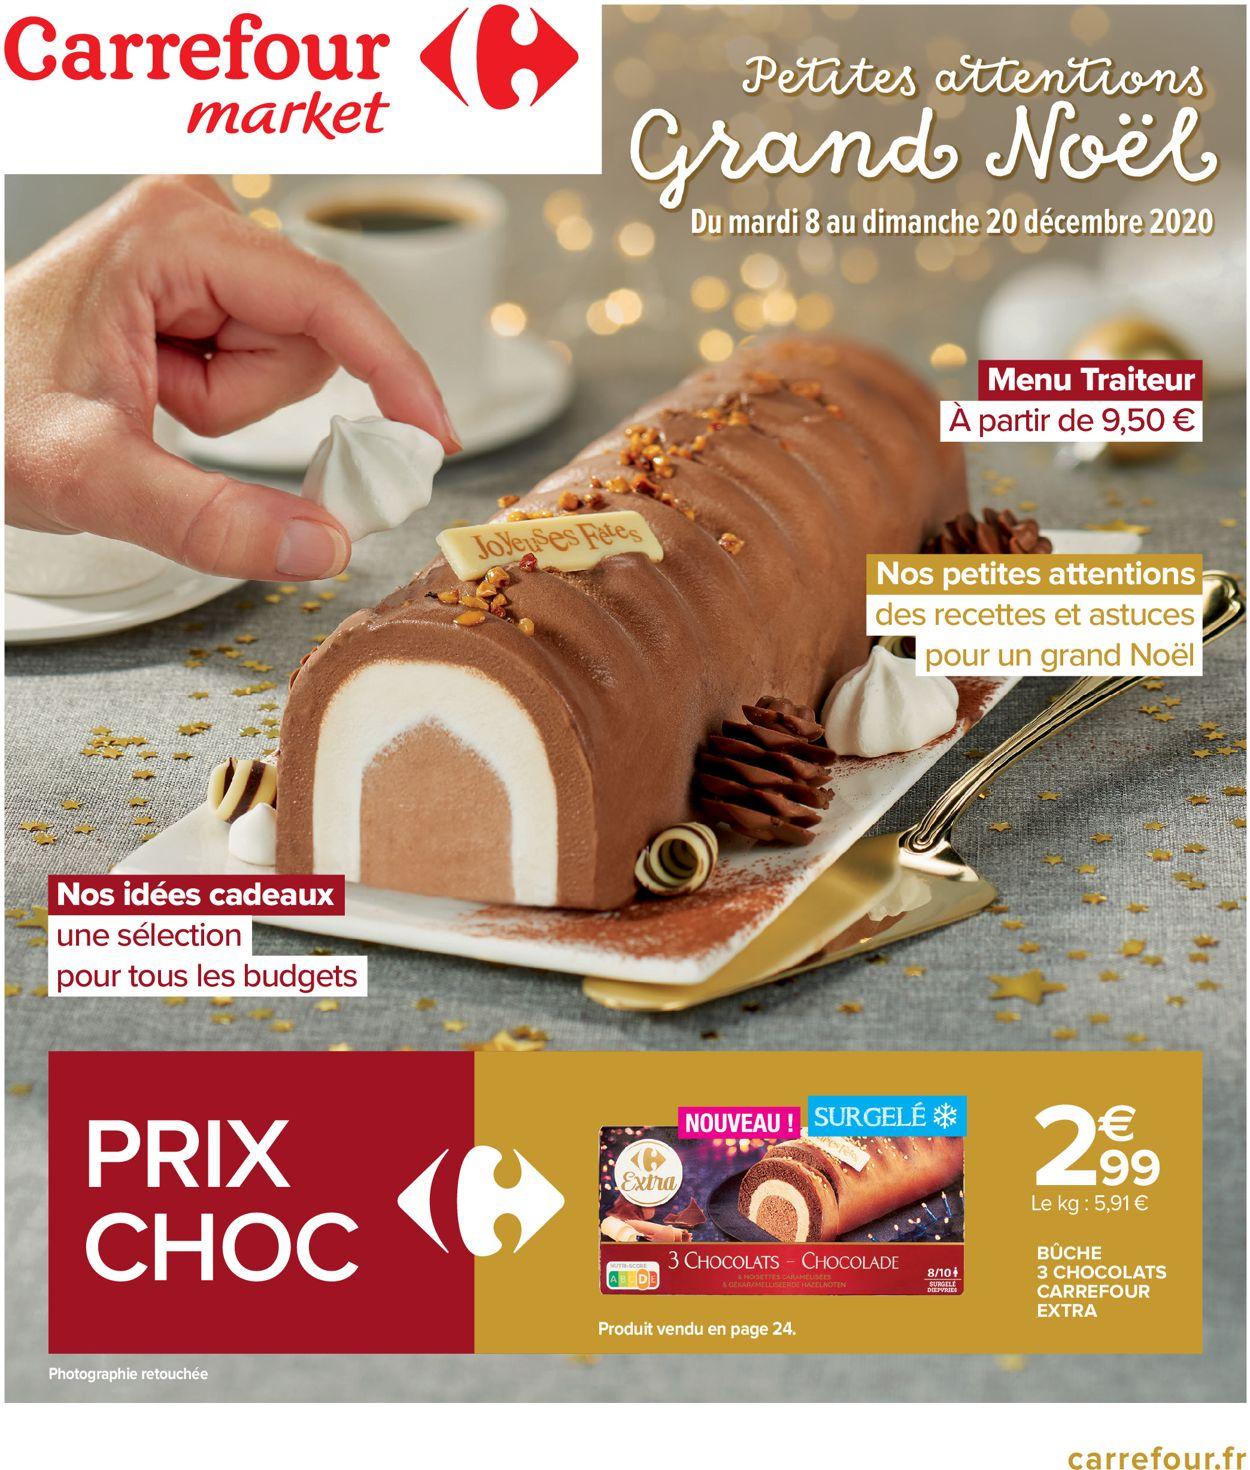 Carrefour Grand Noel 2020 Catalogue - 08.12-20.12.2020